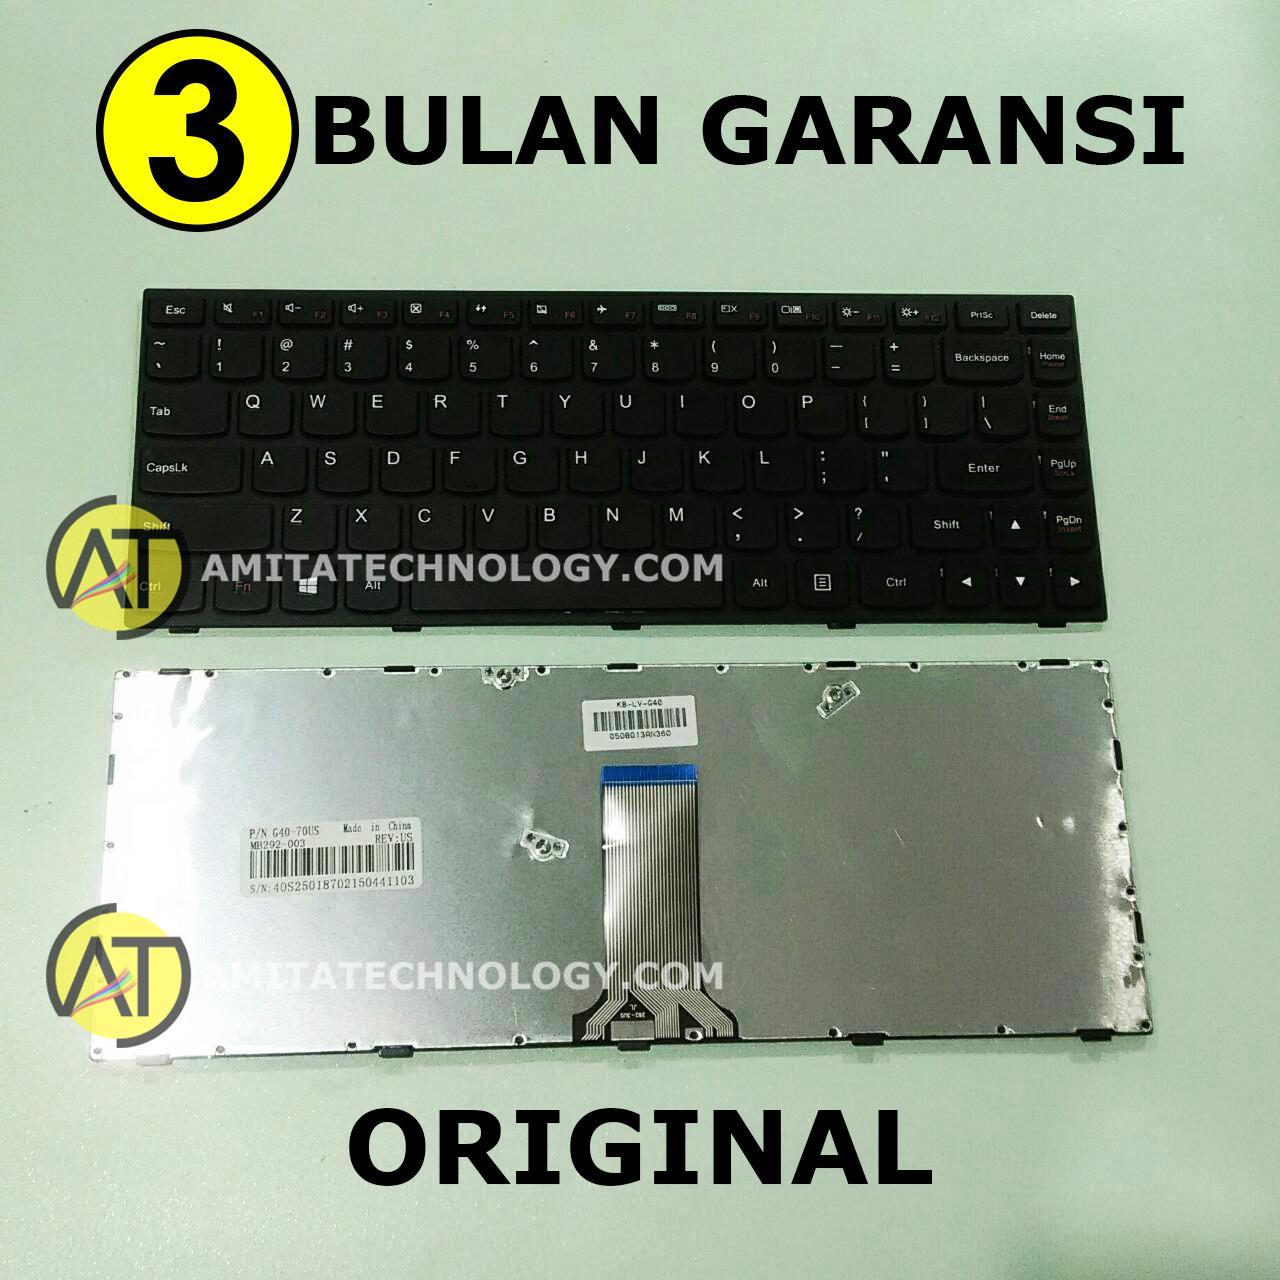 Baru Cocok Untuk Kipas Pendingin Cpu Toshiba Satellite L500 L505 Keyboard L510 M500 M501 M502 M503 M505 M506 Hitam Harga L555 L355 L505d A505 P505 Source Laptop Original